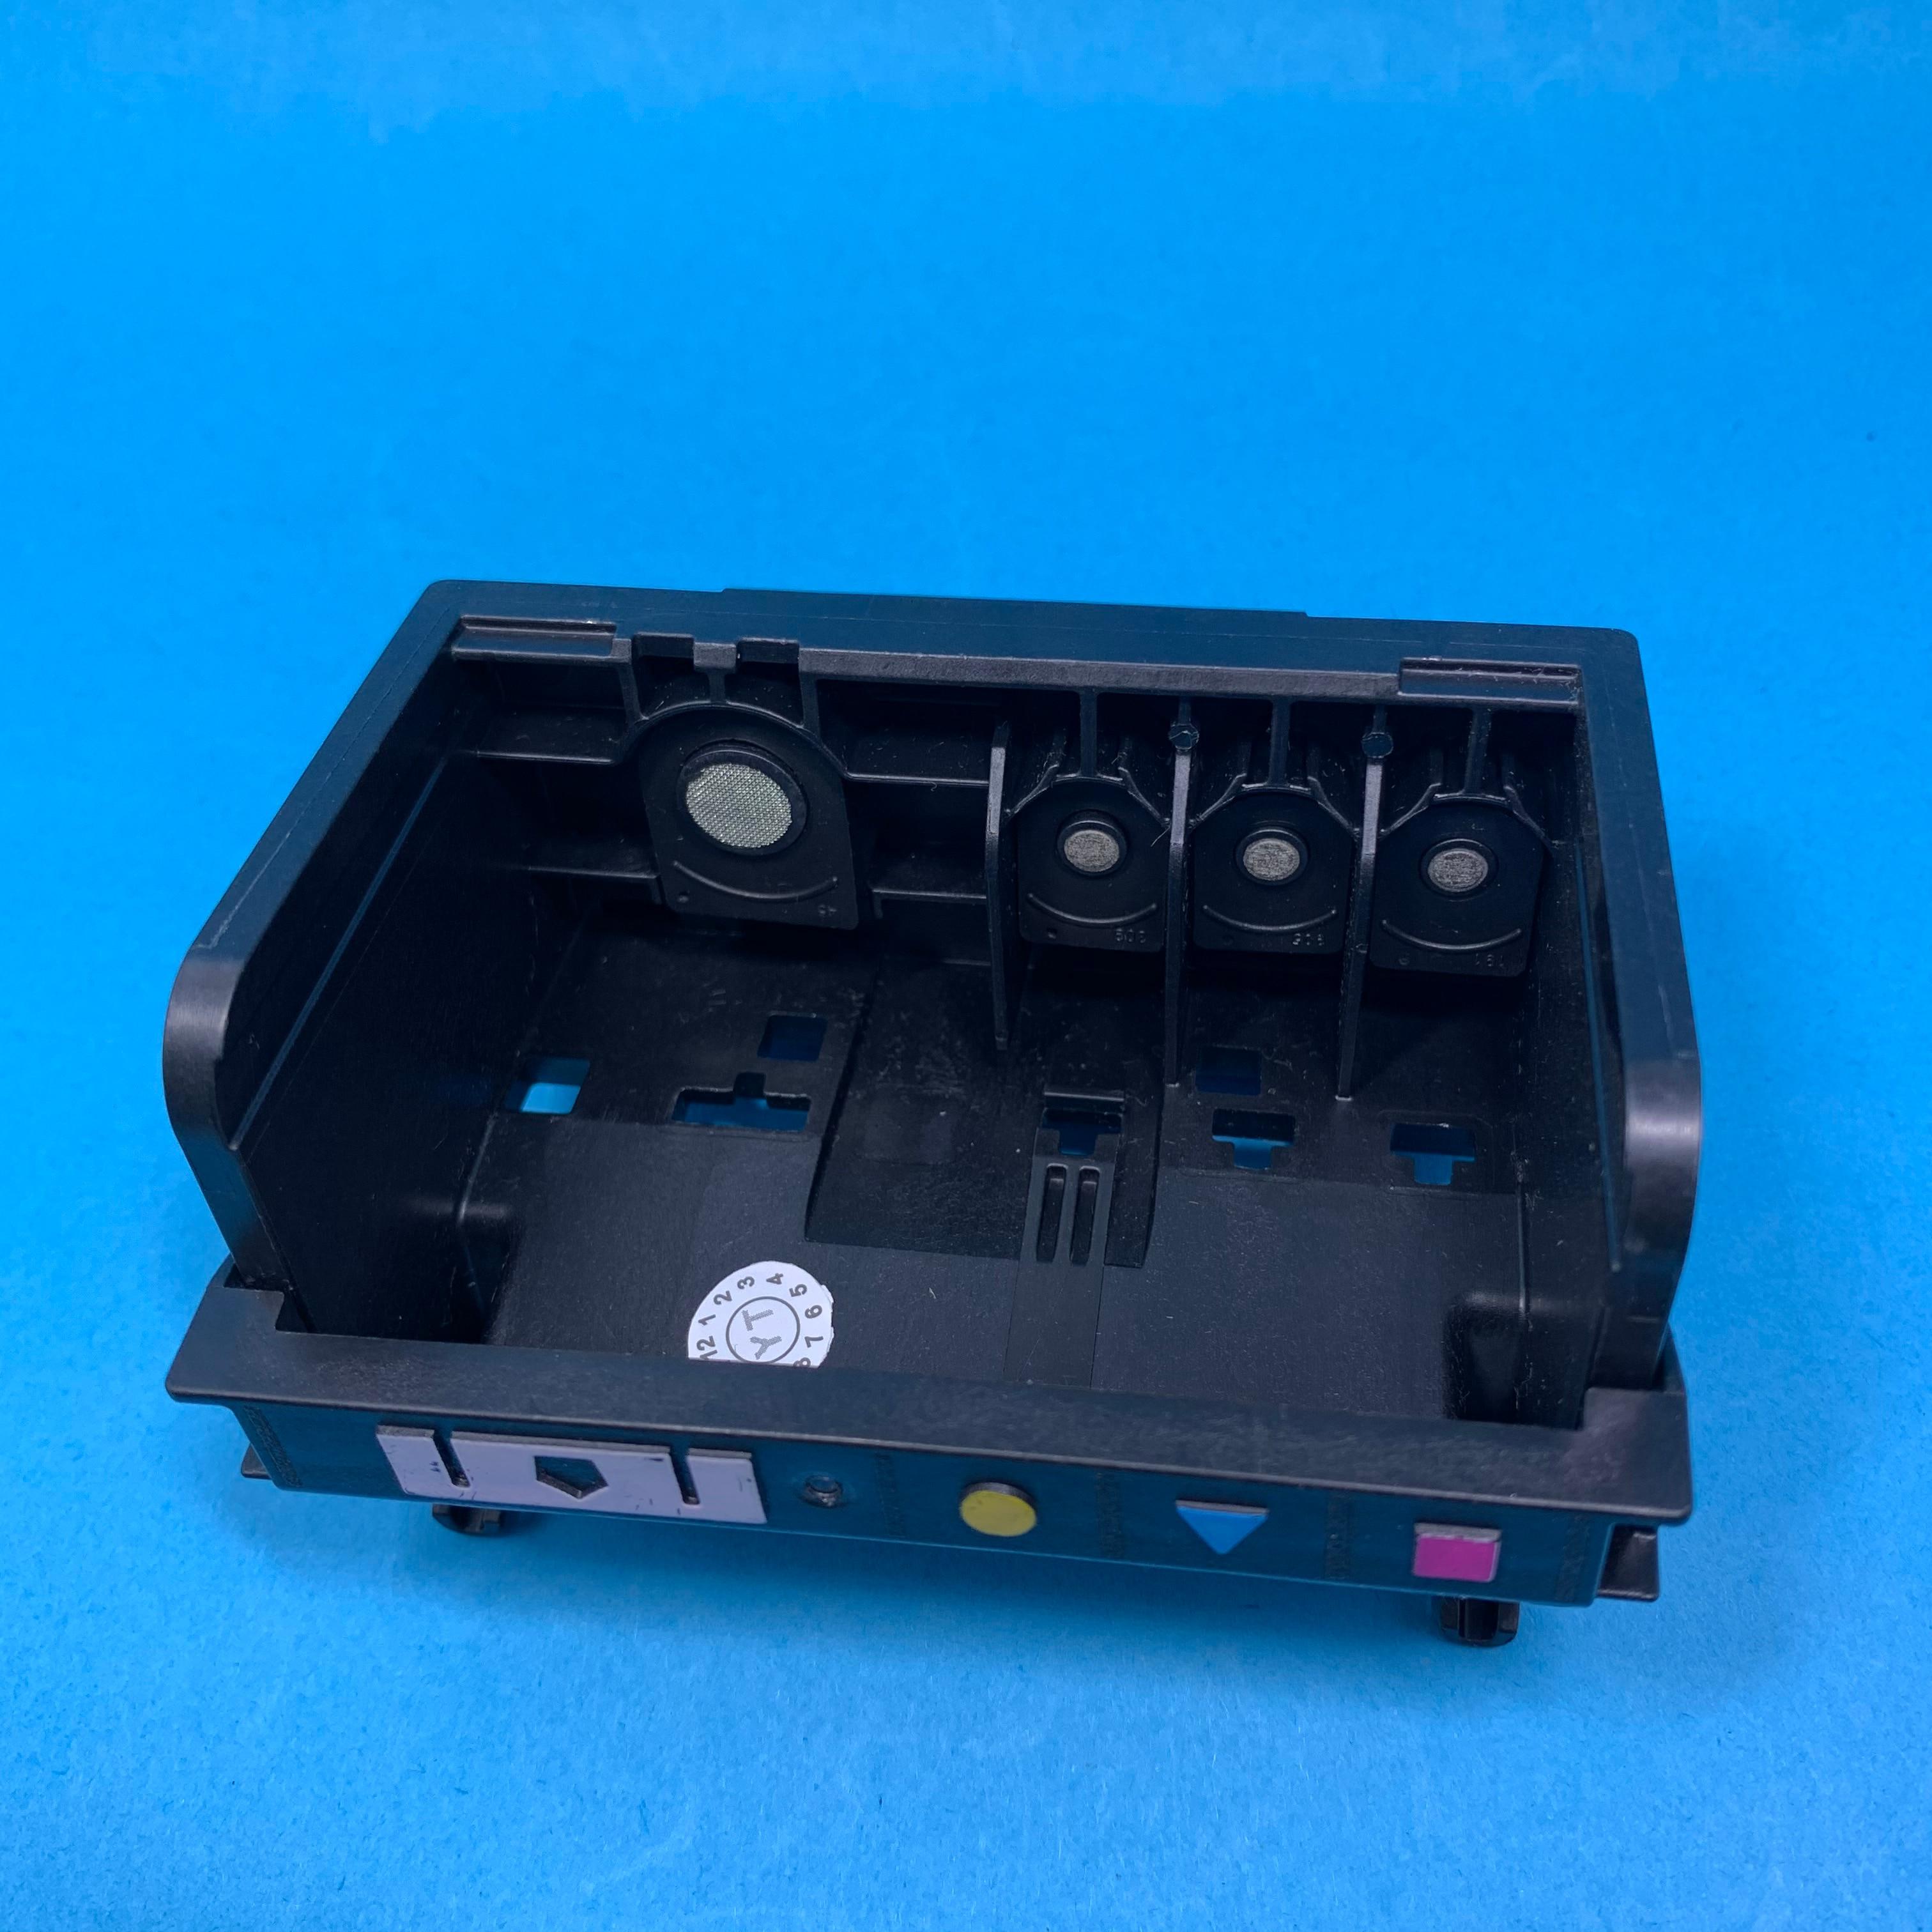 YOTAT 4slot remanufactured 564 printhead for hp564 print head for HP Photosmart D5460 D5463 D5468 C5324 printer